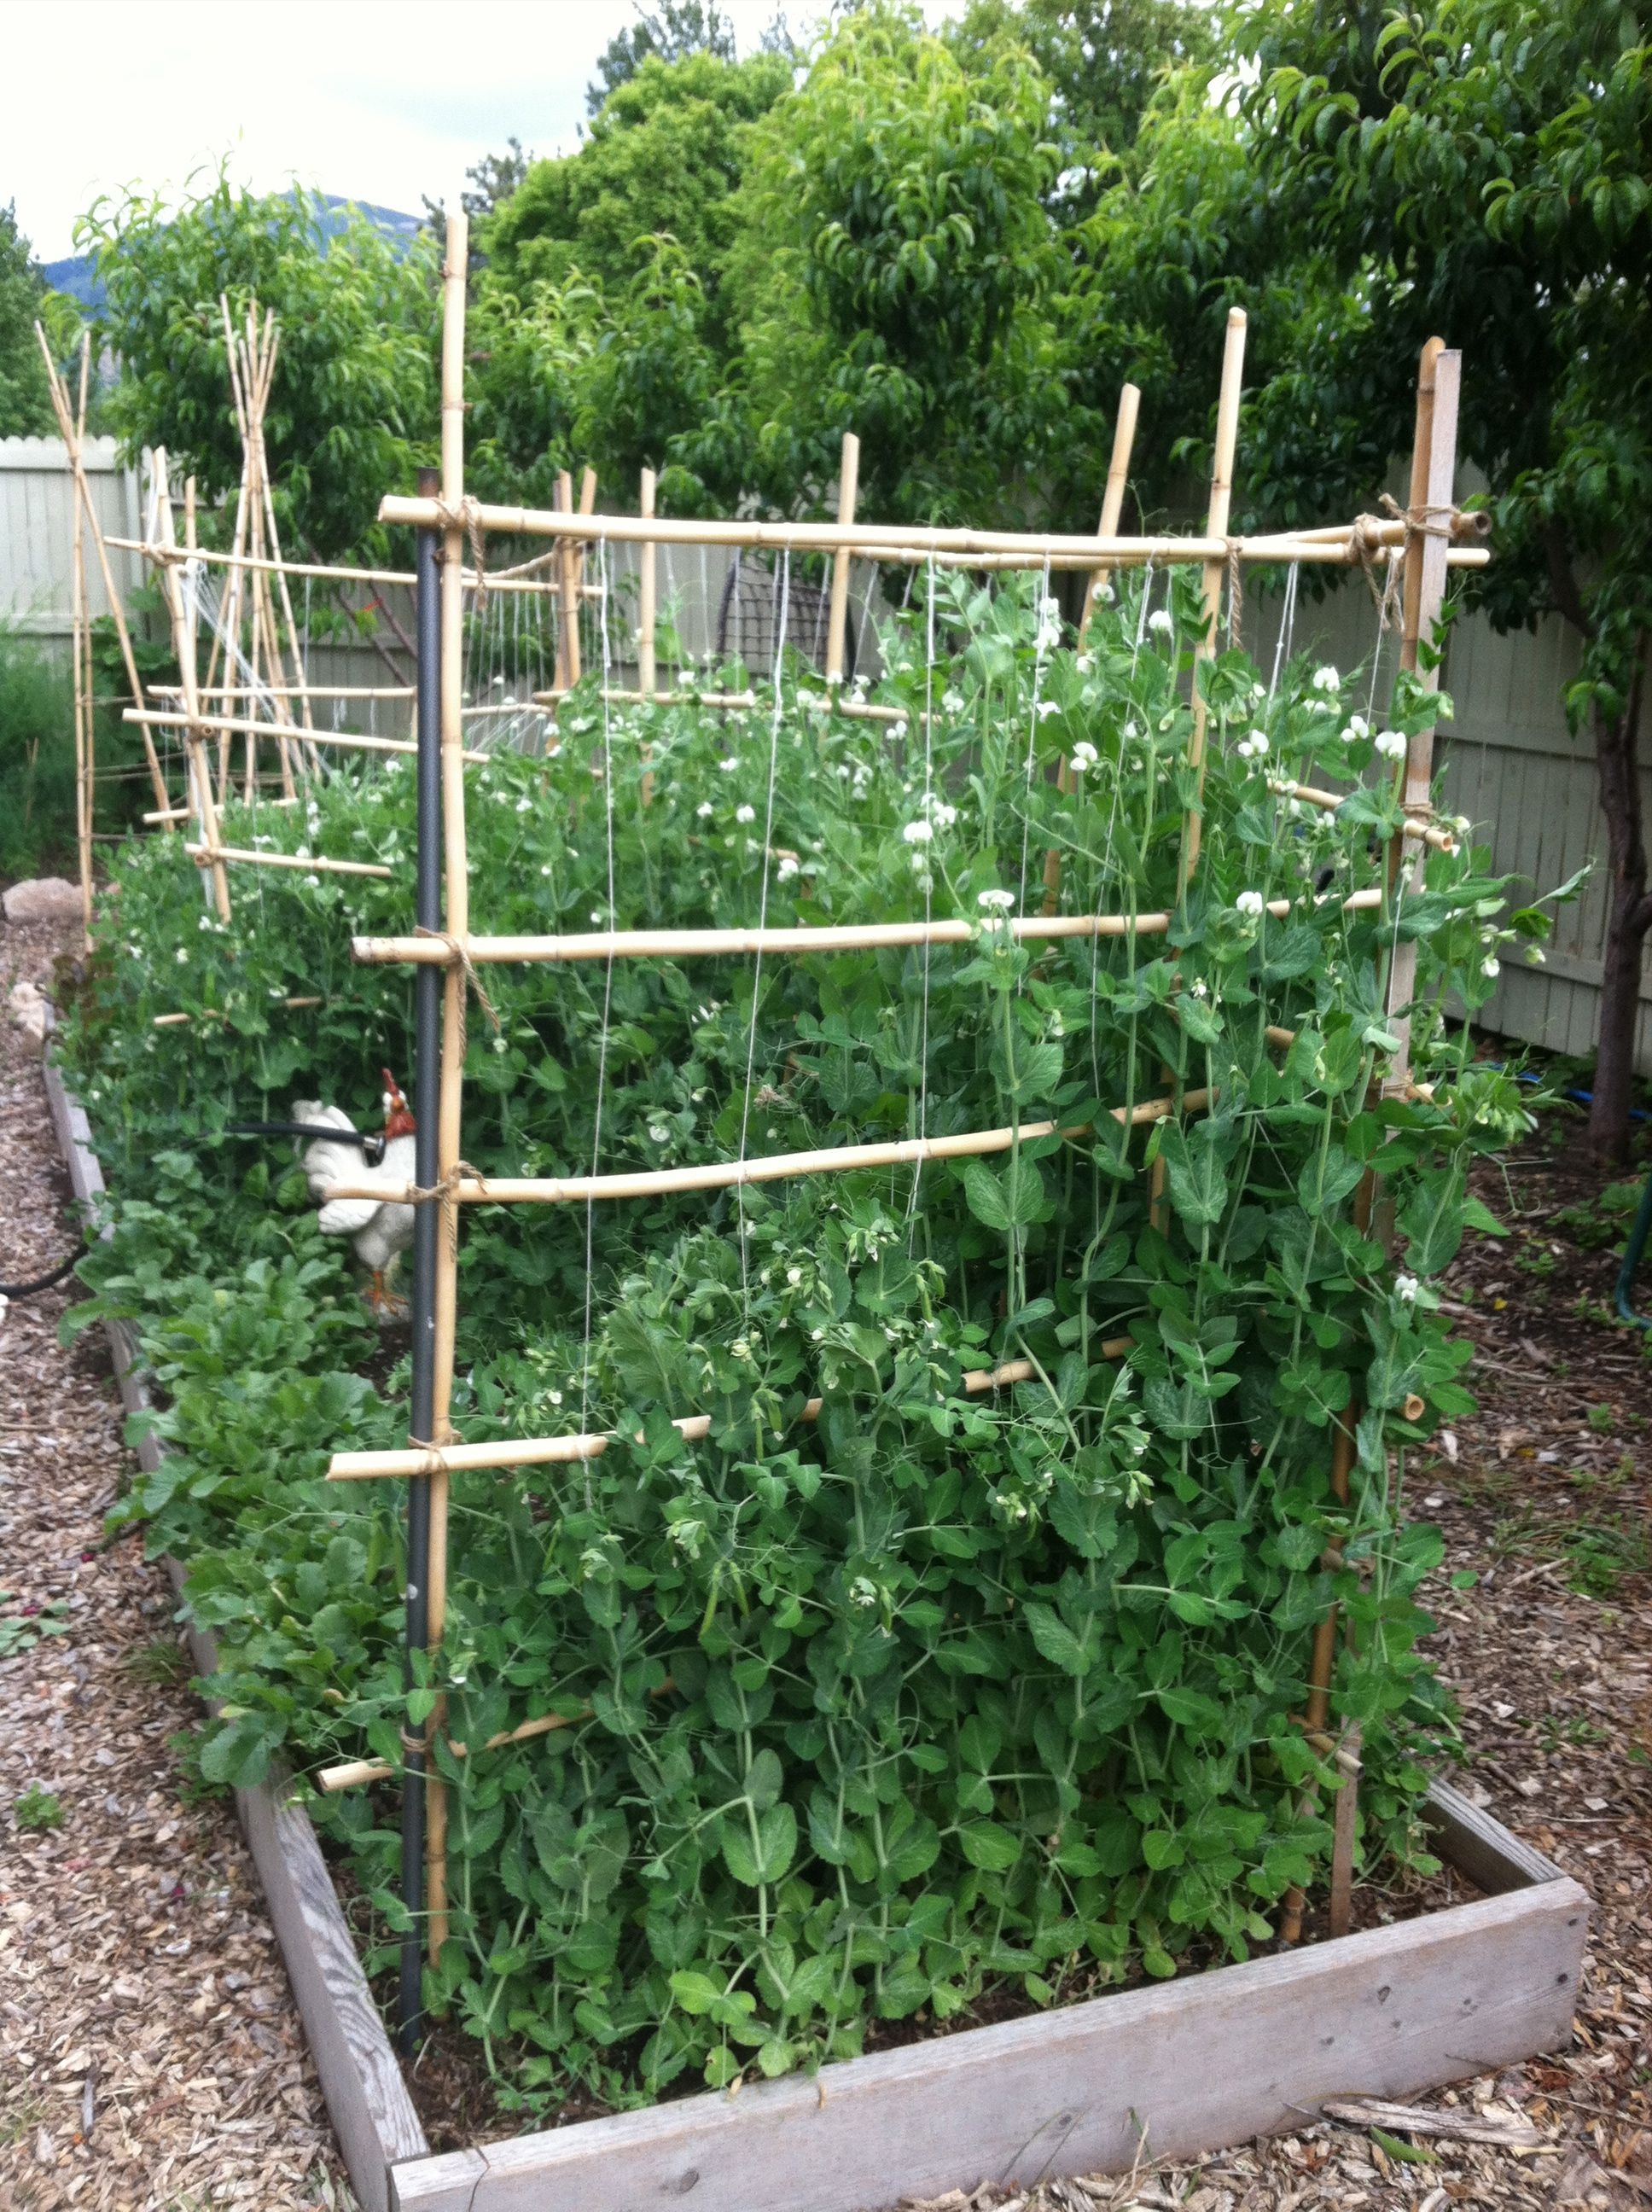 Snap Pea Support Bamboo  Twine Garden Pinterest Snap Peas - Vegetable garden trellis ideas